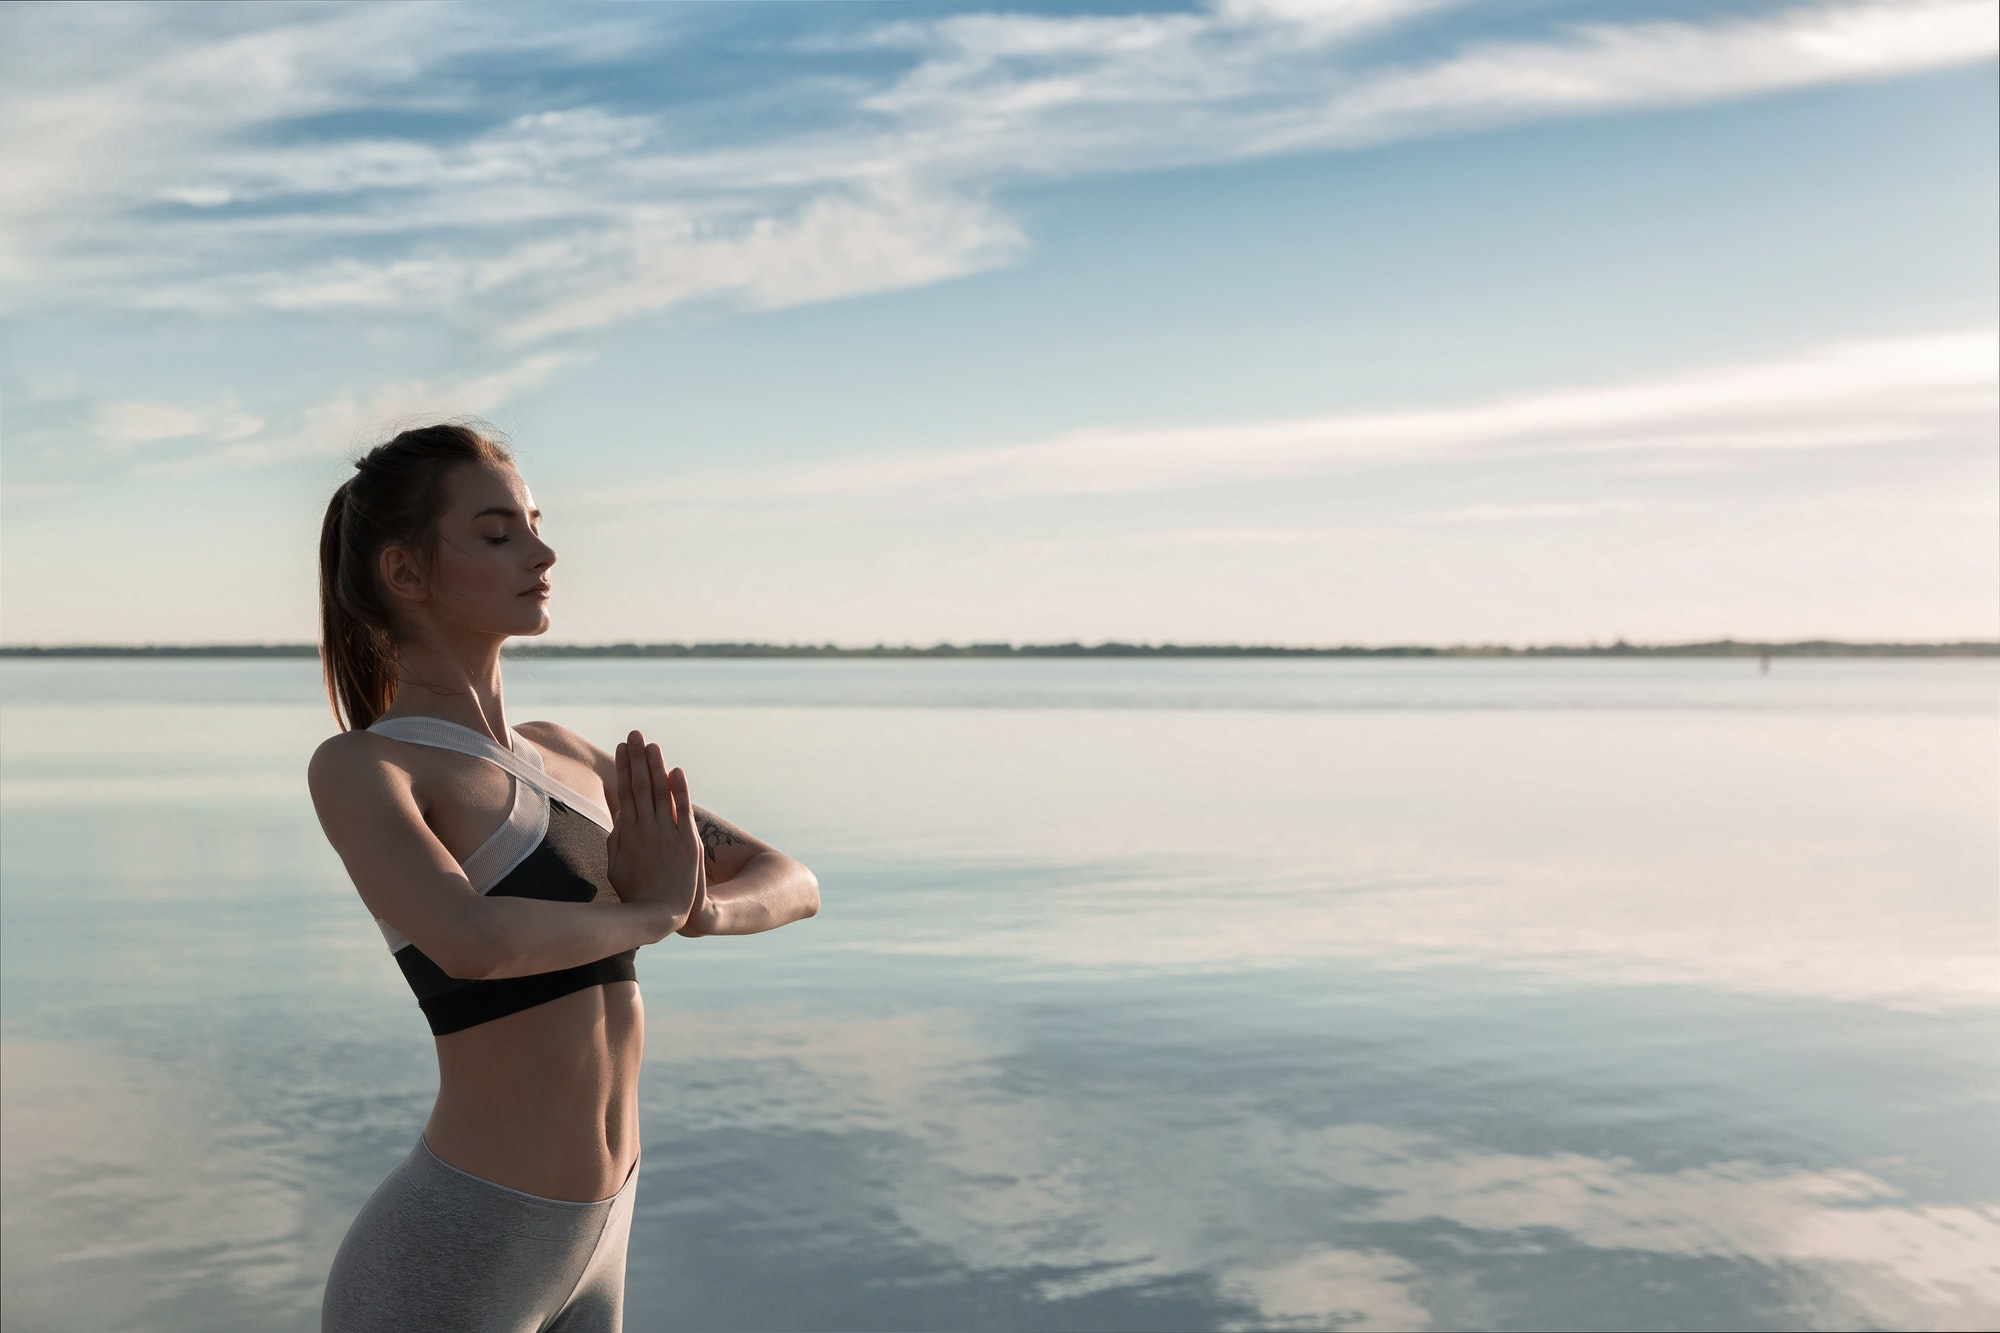 Sports beautiful woman at the beach meditation.